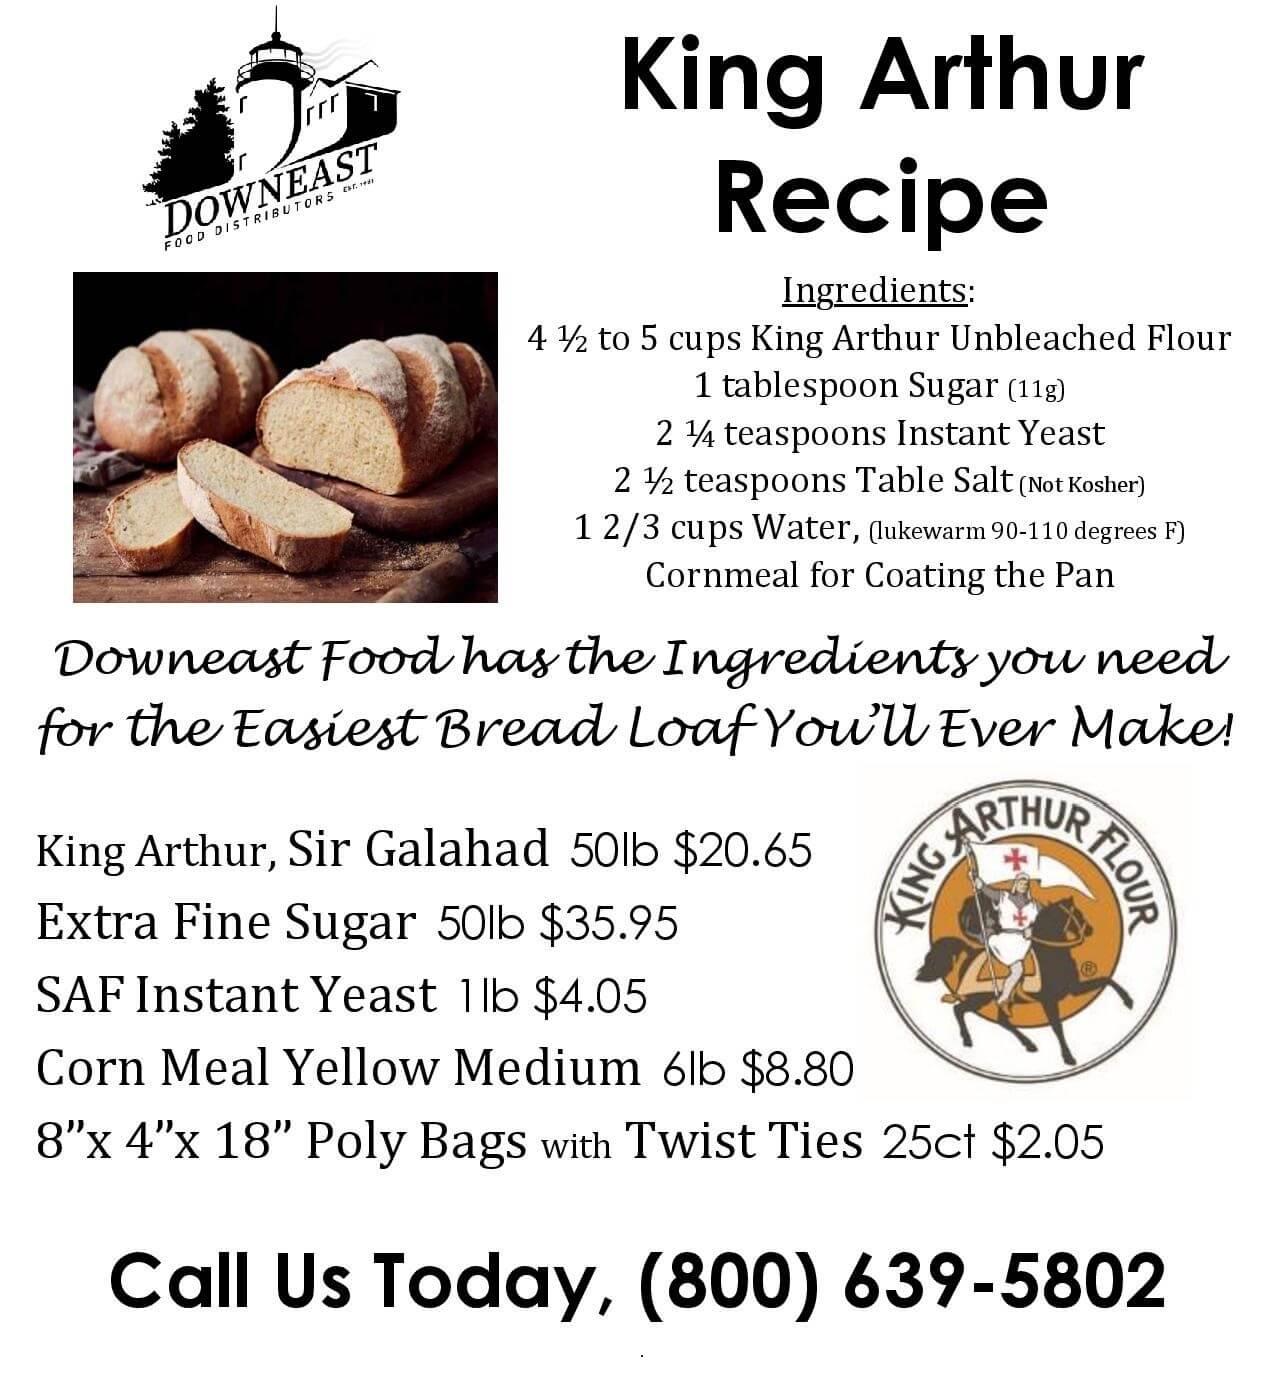 King Arthur Recipe